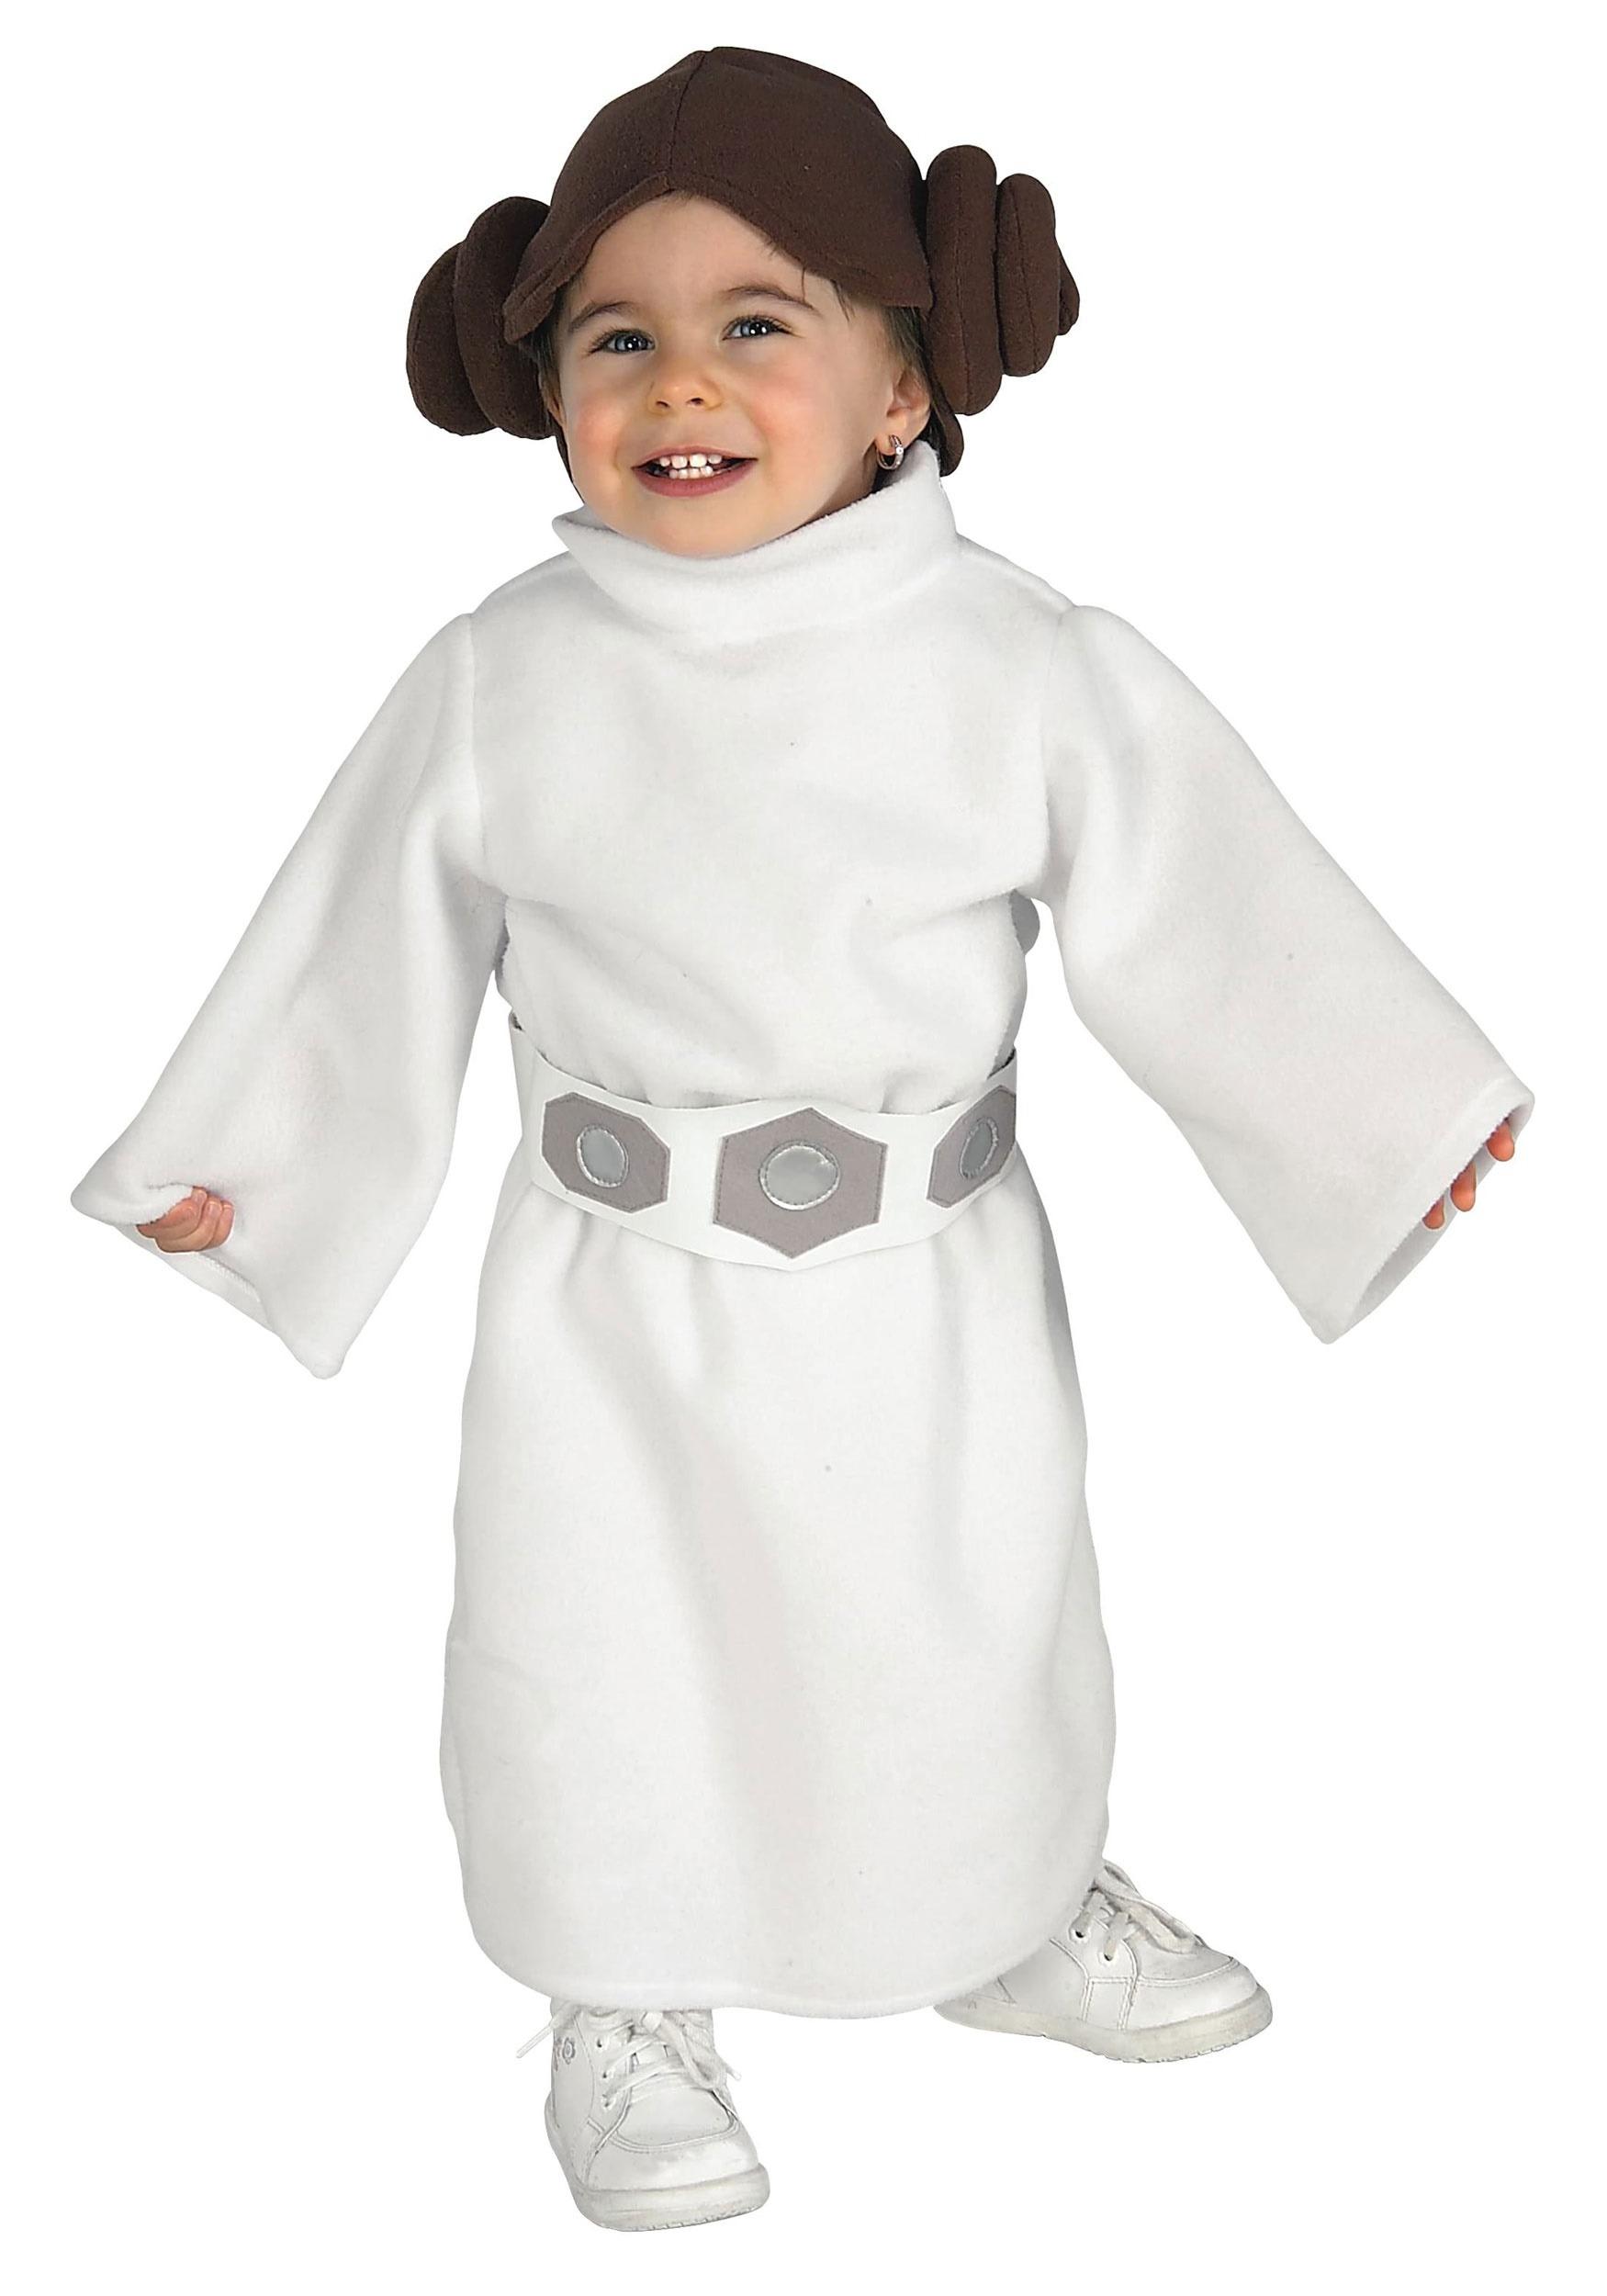 Toddler Princess Leia Costume Baby Princess Leia Costume